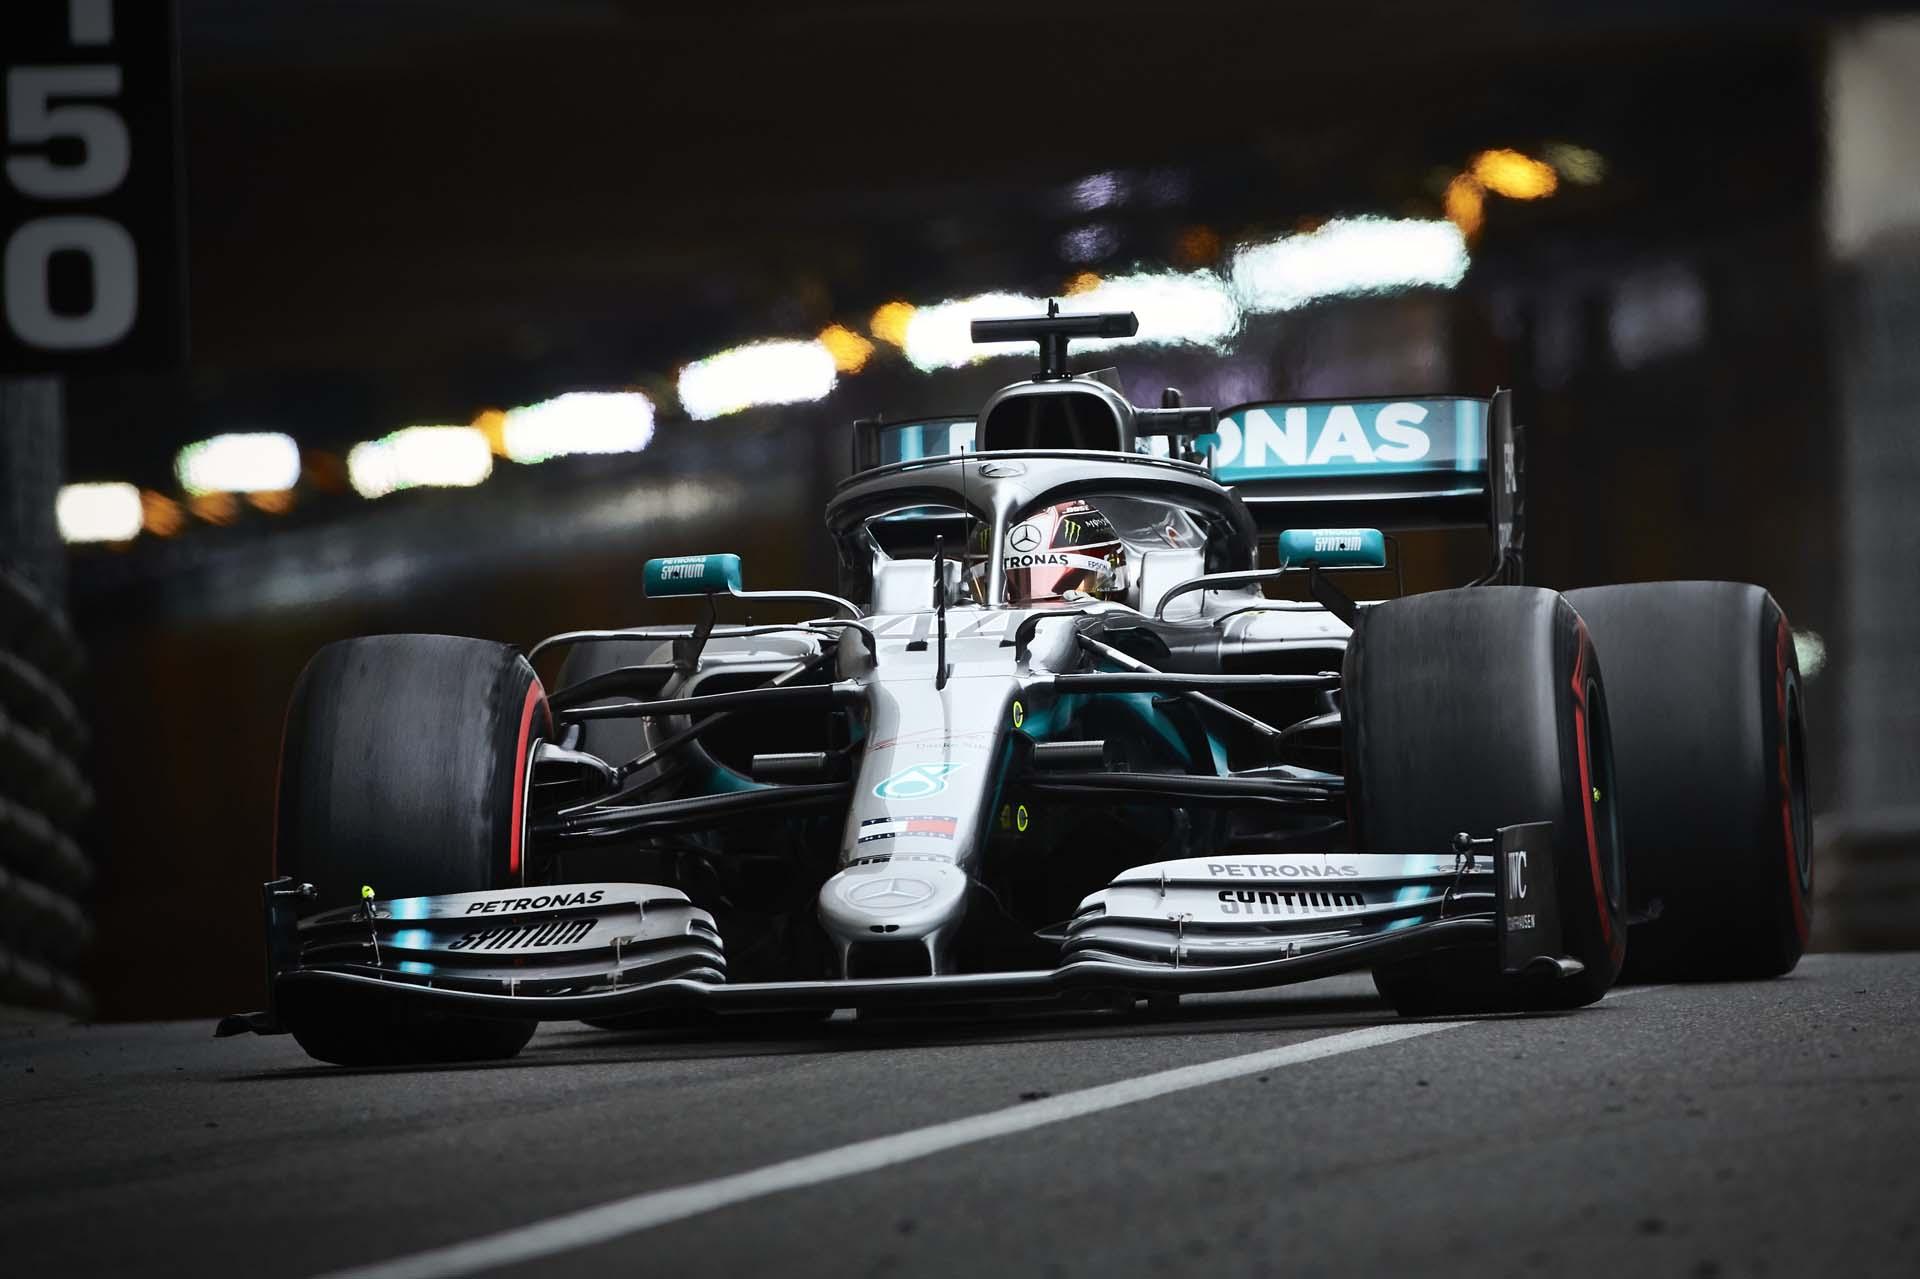 Großer Preis von Monaco 2019, Donnerstag - Steve Etherington